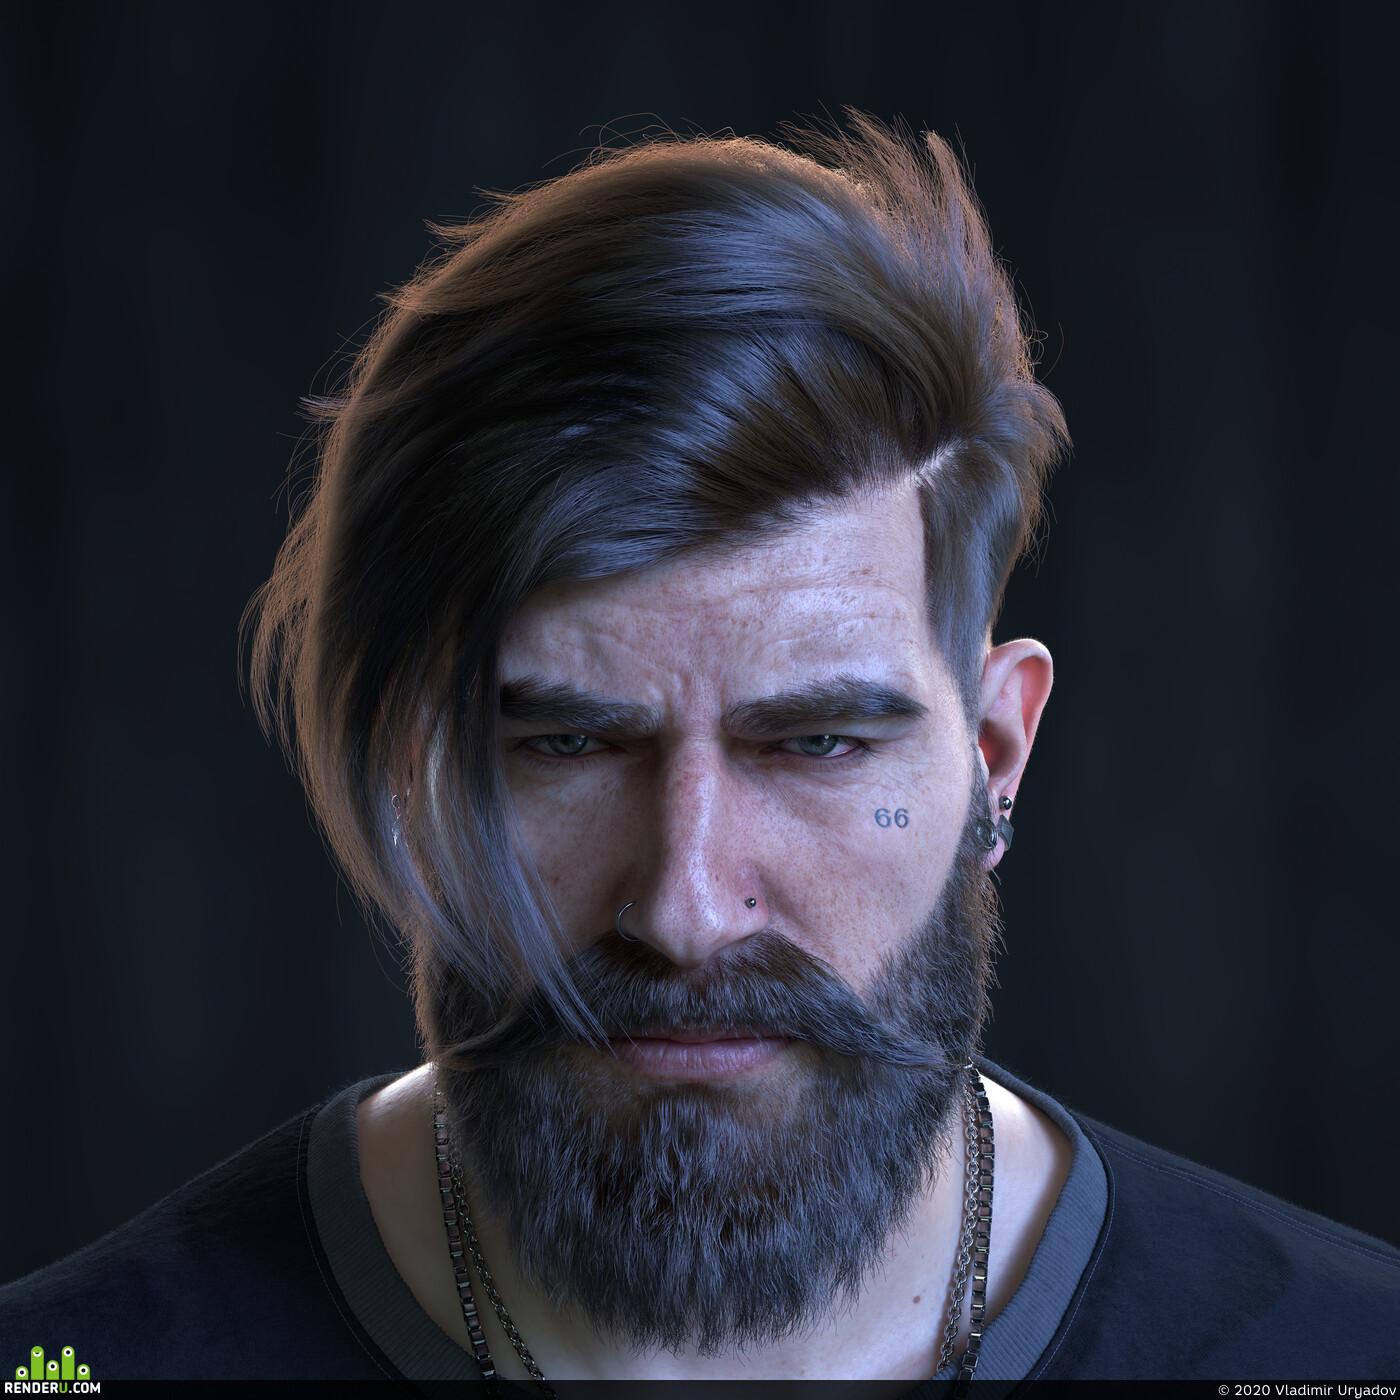 lumberjack, 66